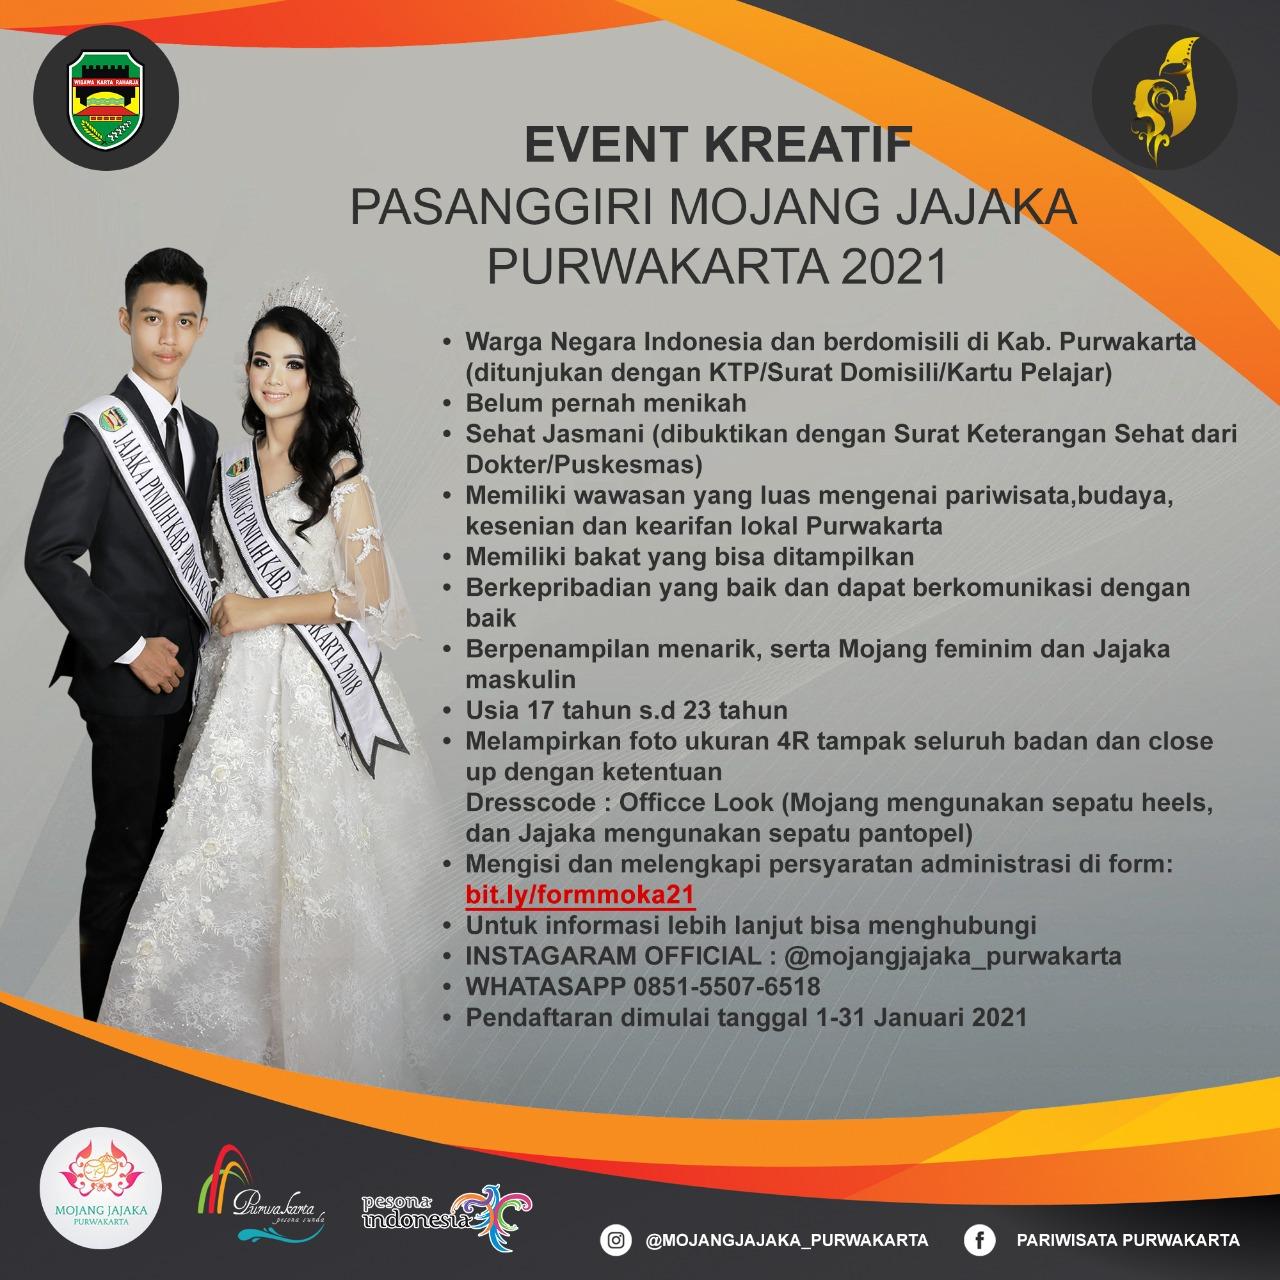 Even Kreatif Pasanggiri Mojang Jajaka Purwakarta 2021